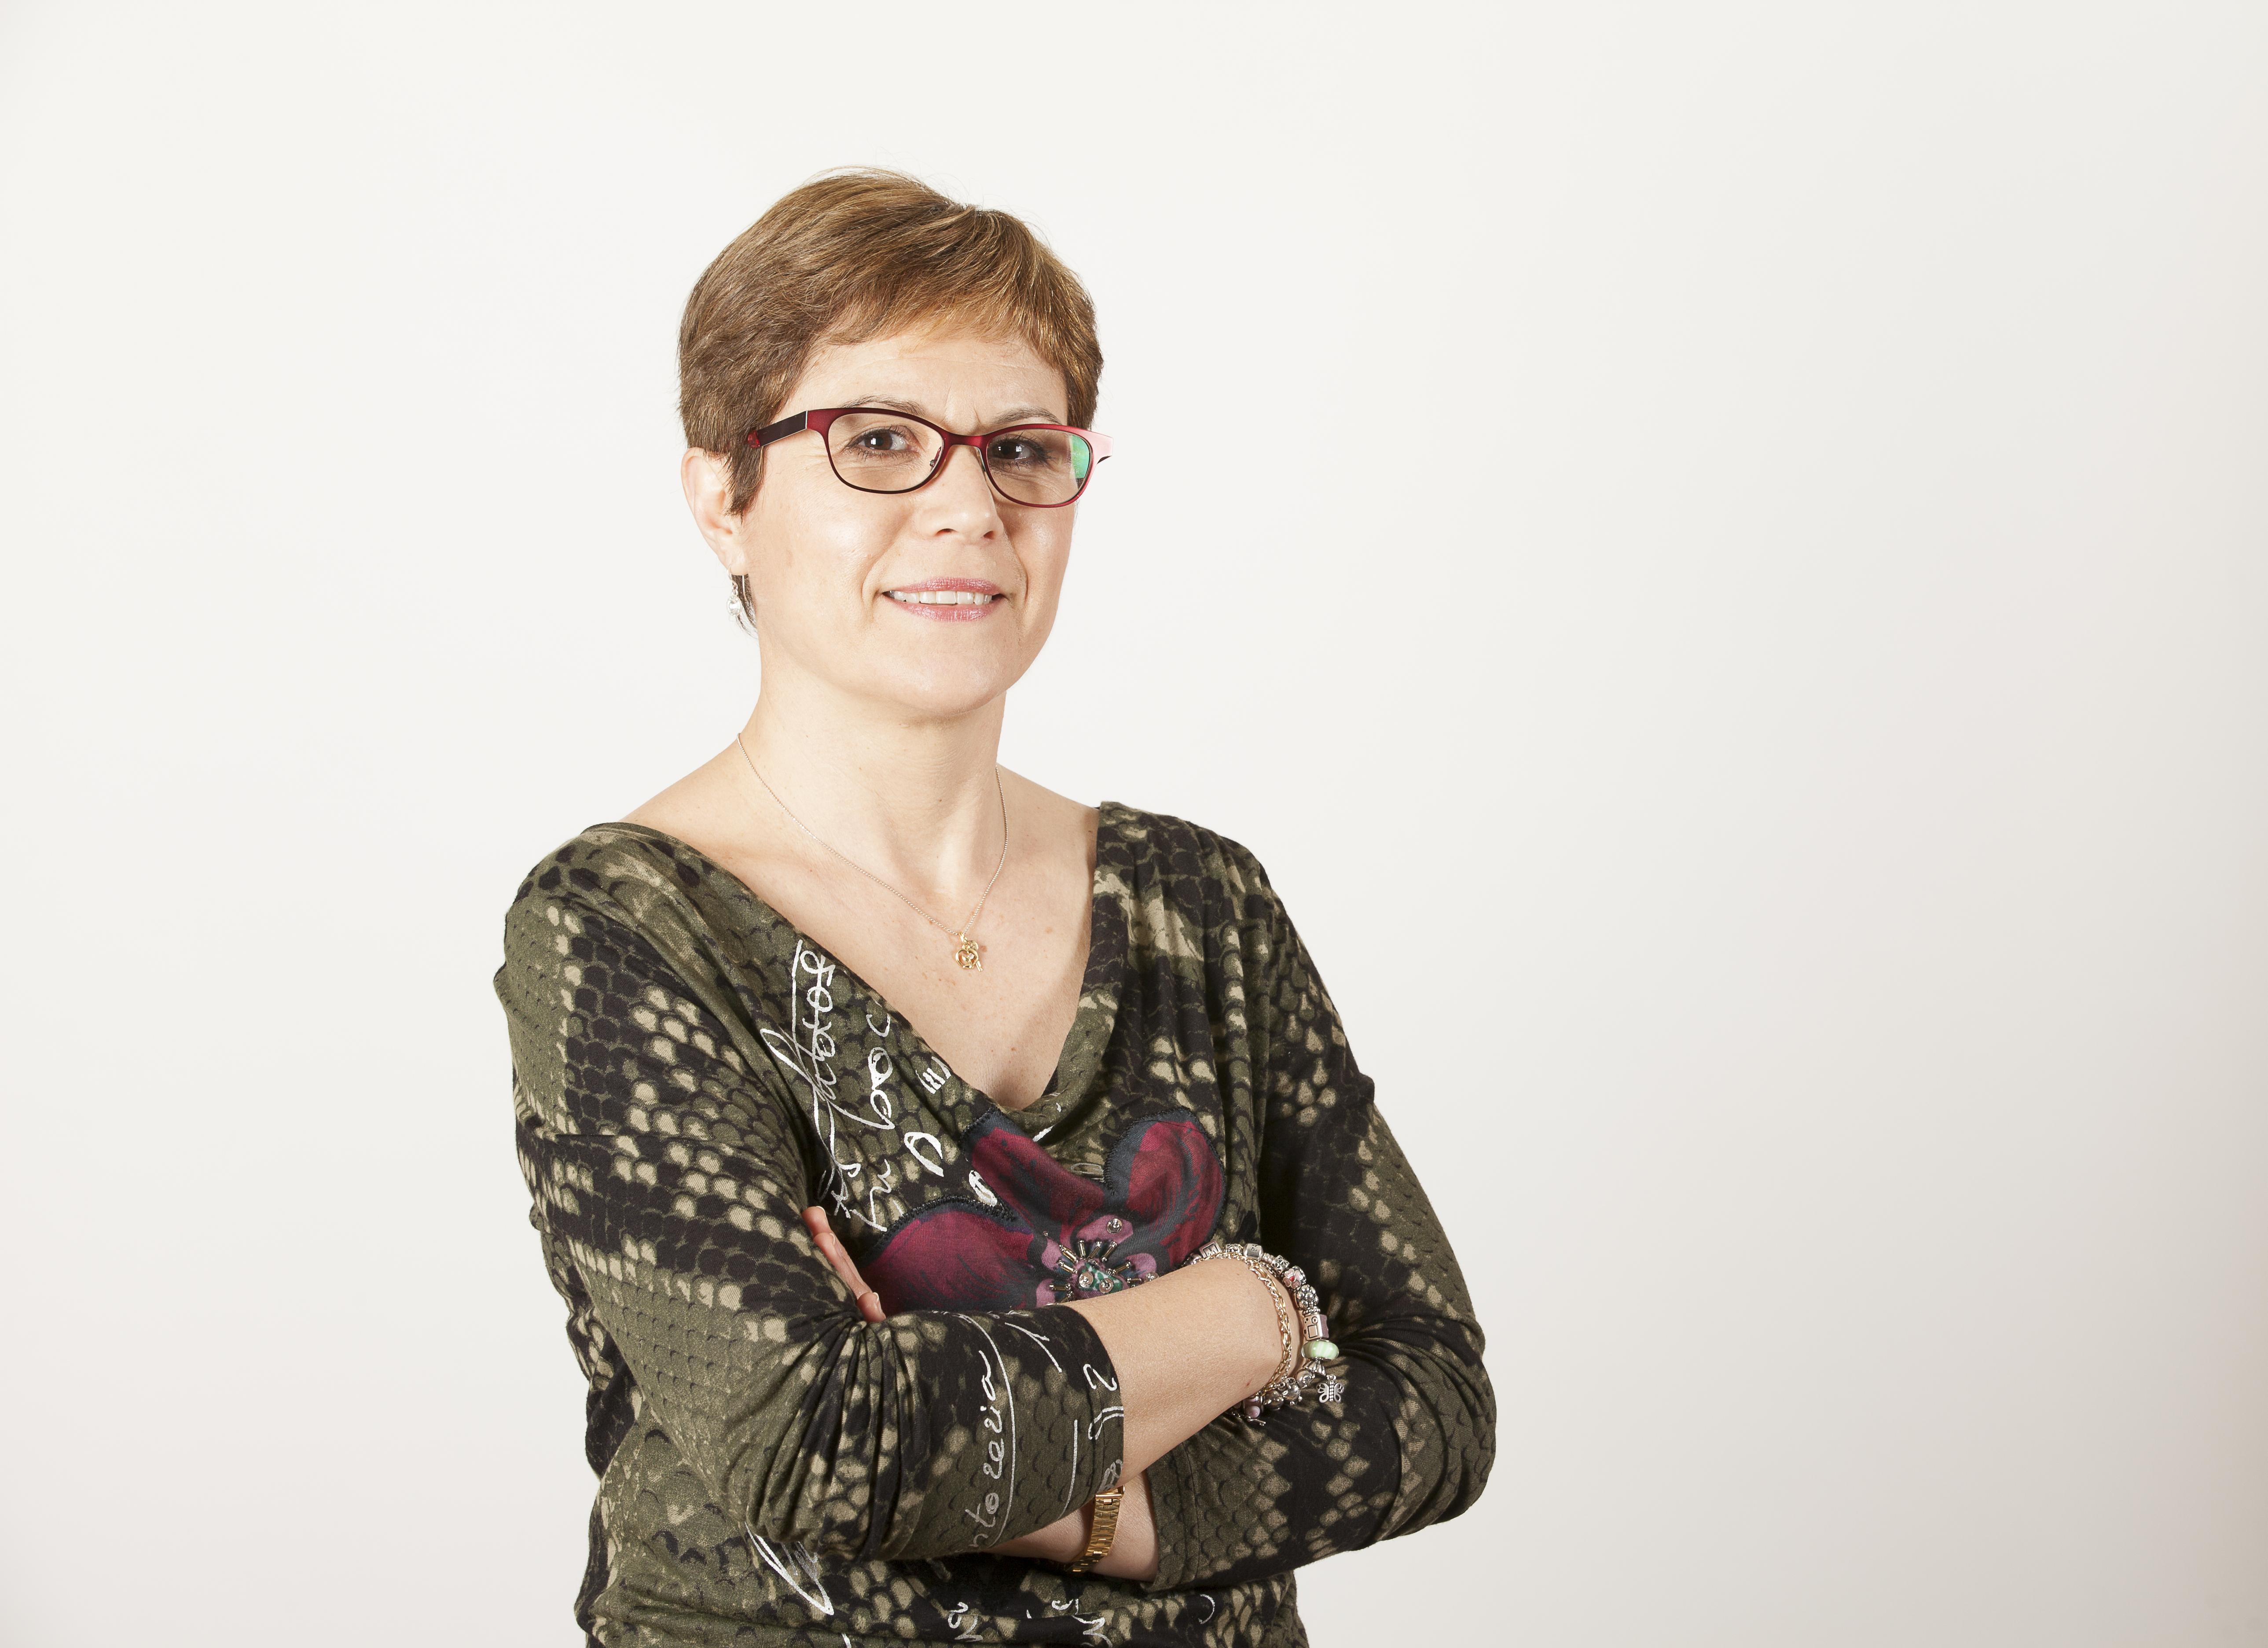 María Teresa Roselló Puig